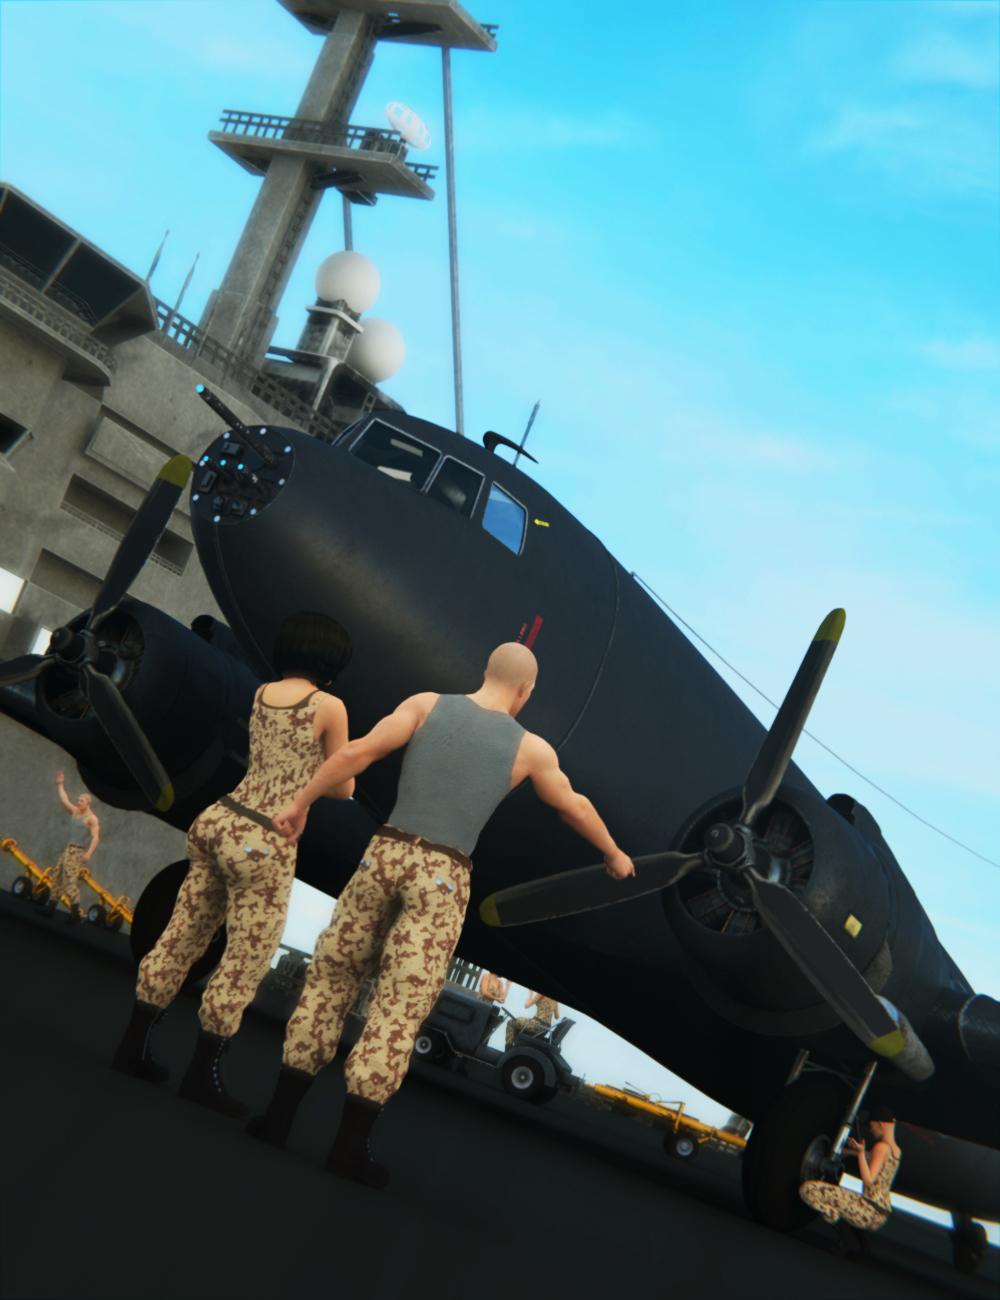 Douglas Cargo Plane by: Mely3D, 3D Models by Daz 3D